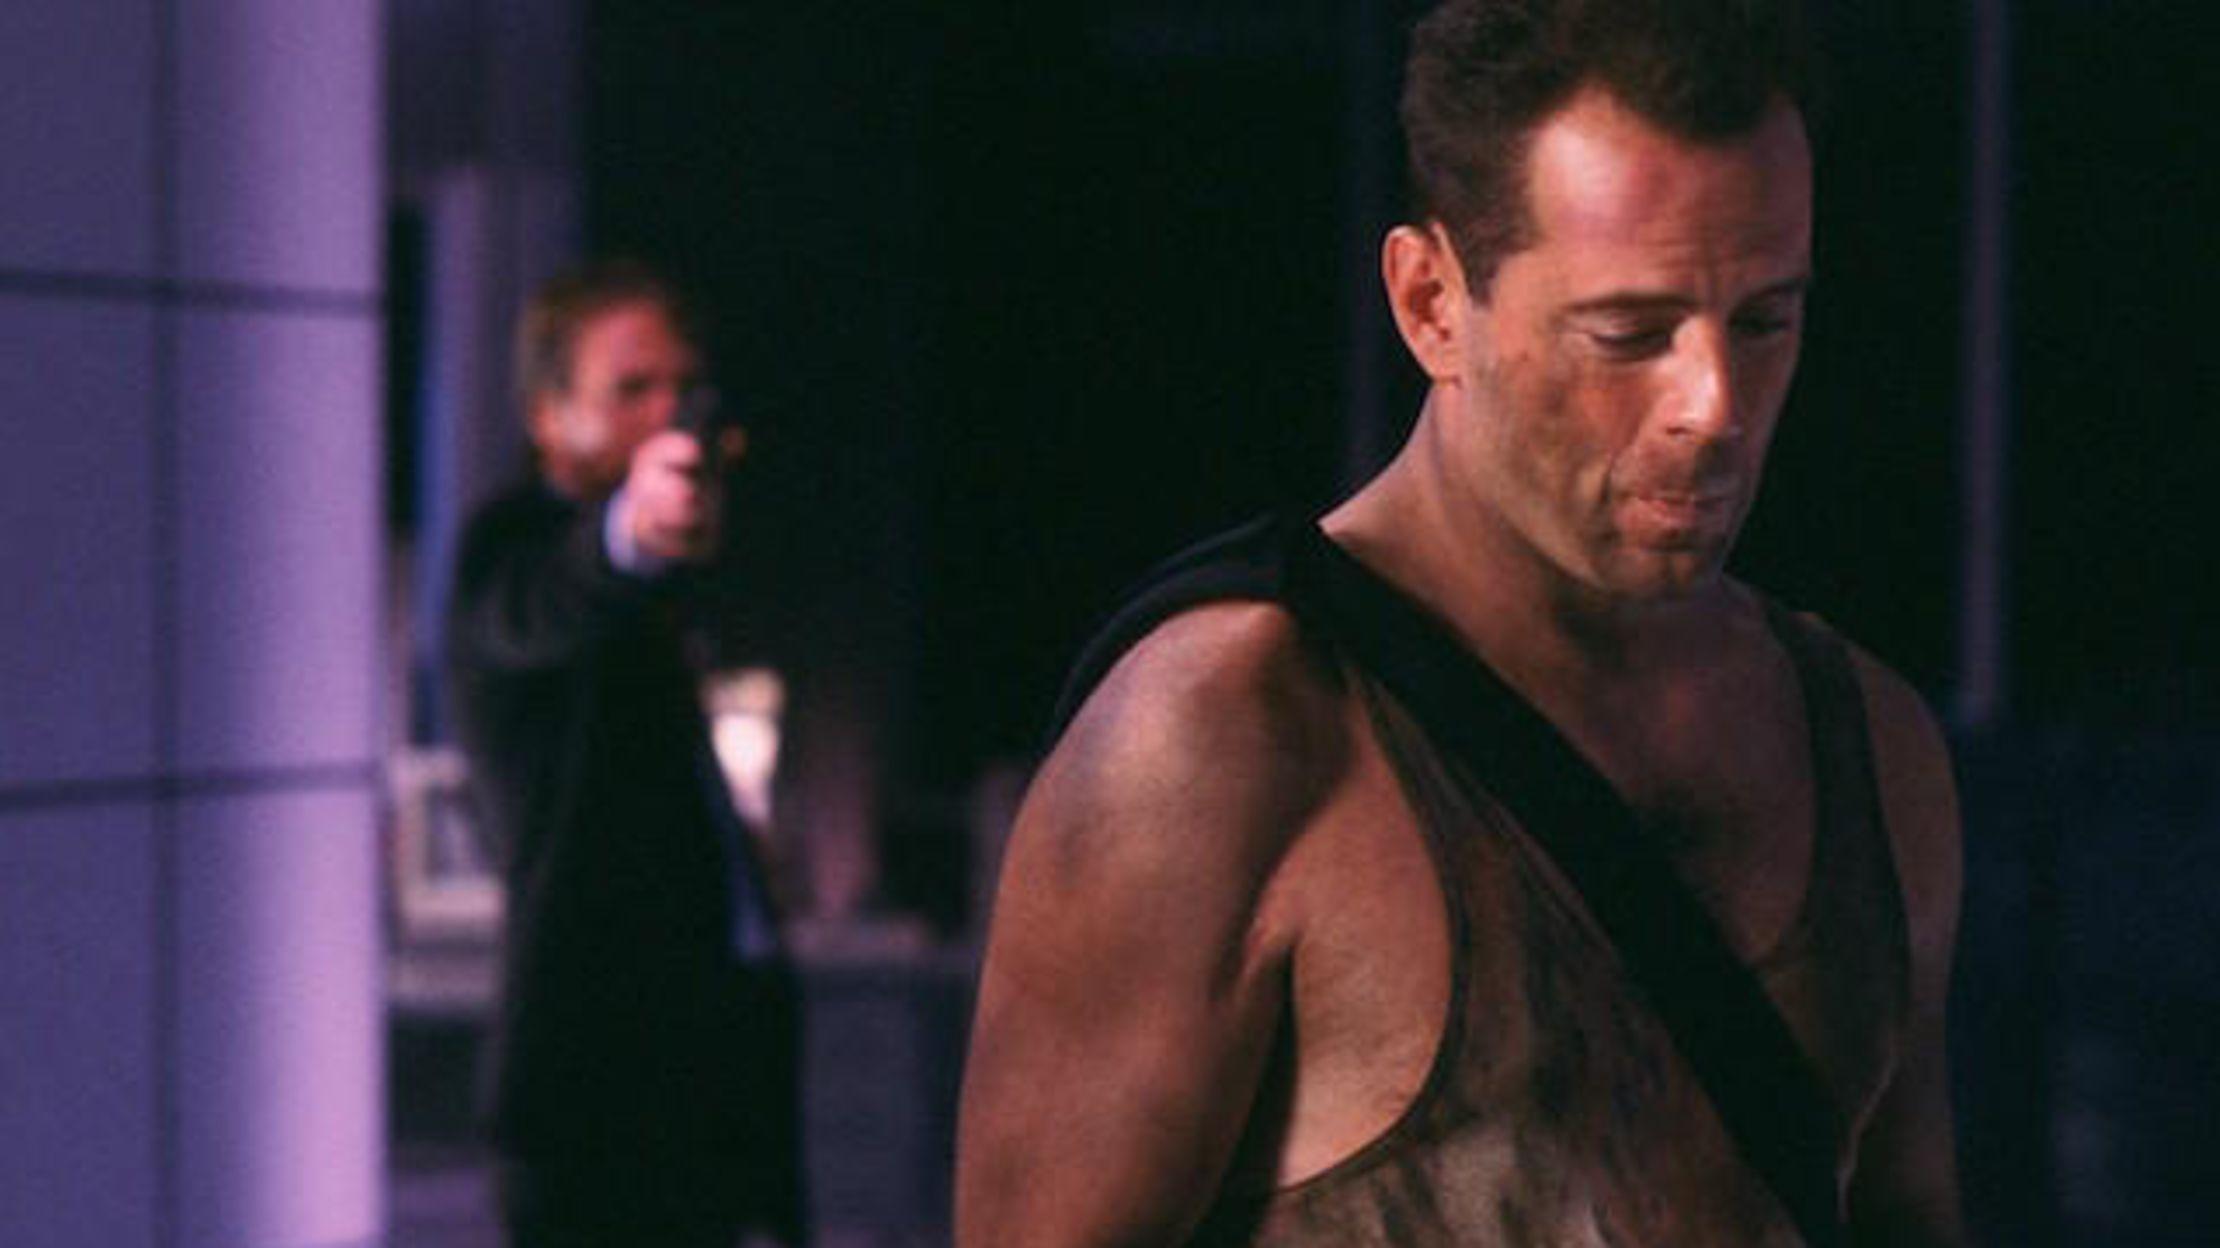 A Deleted Die Hard Scene Explains One Major Plot Hole